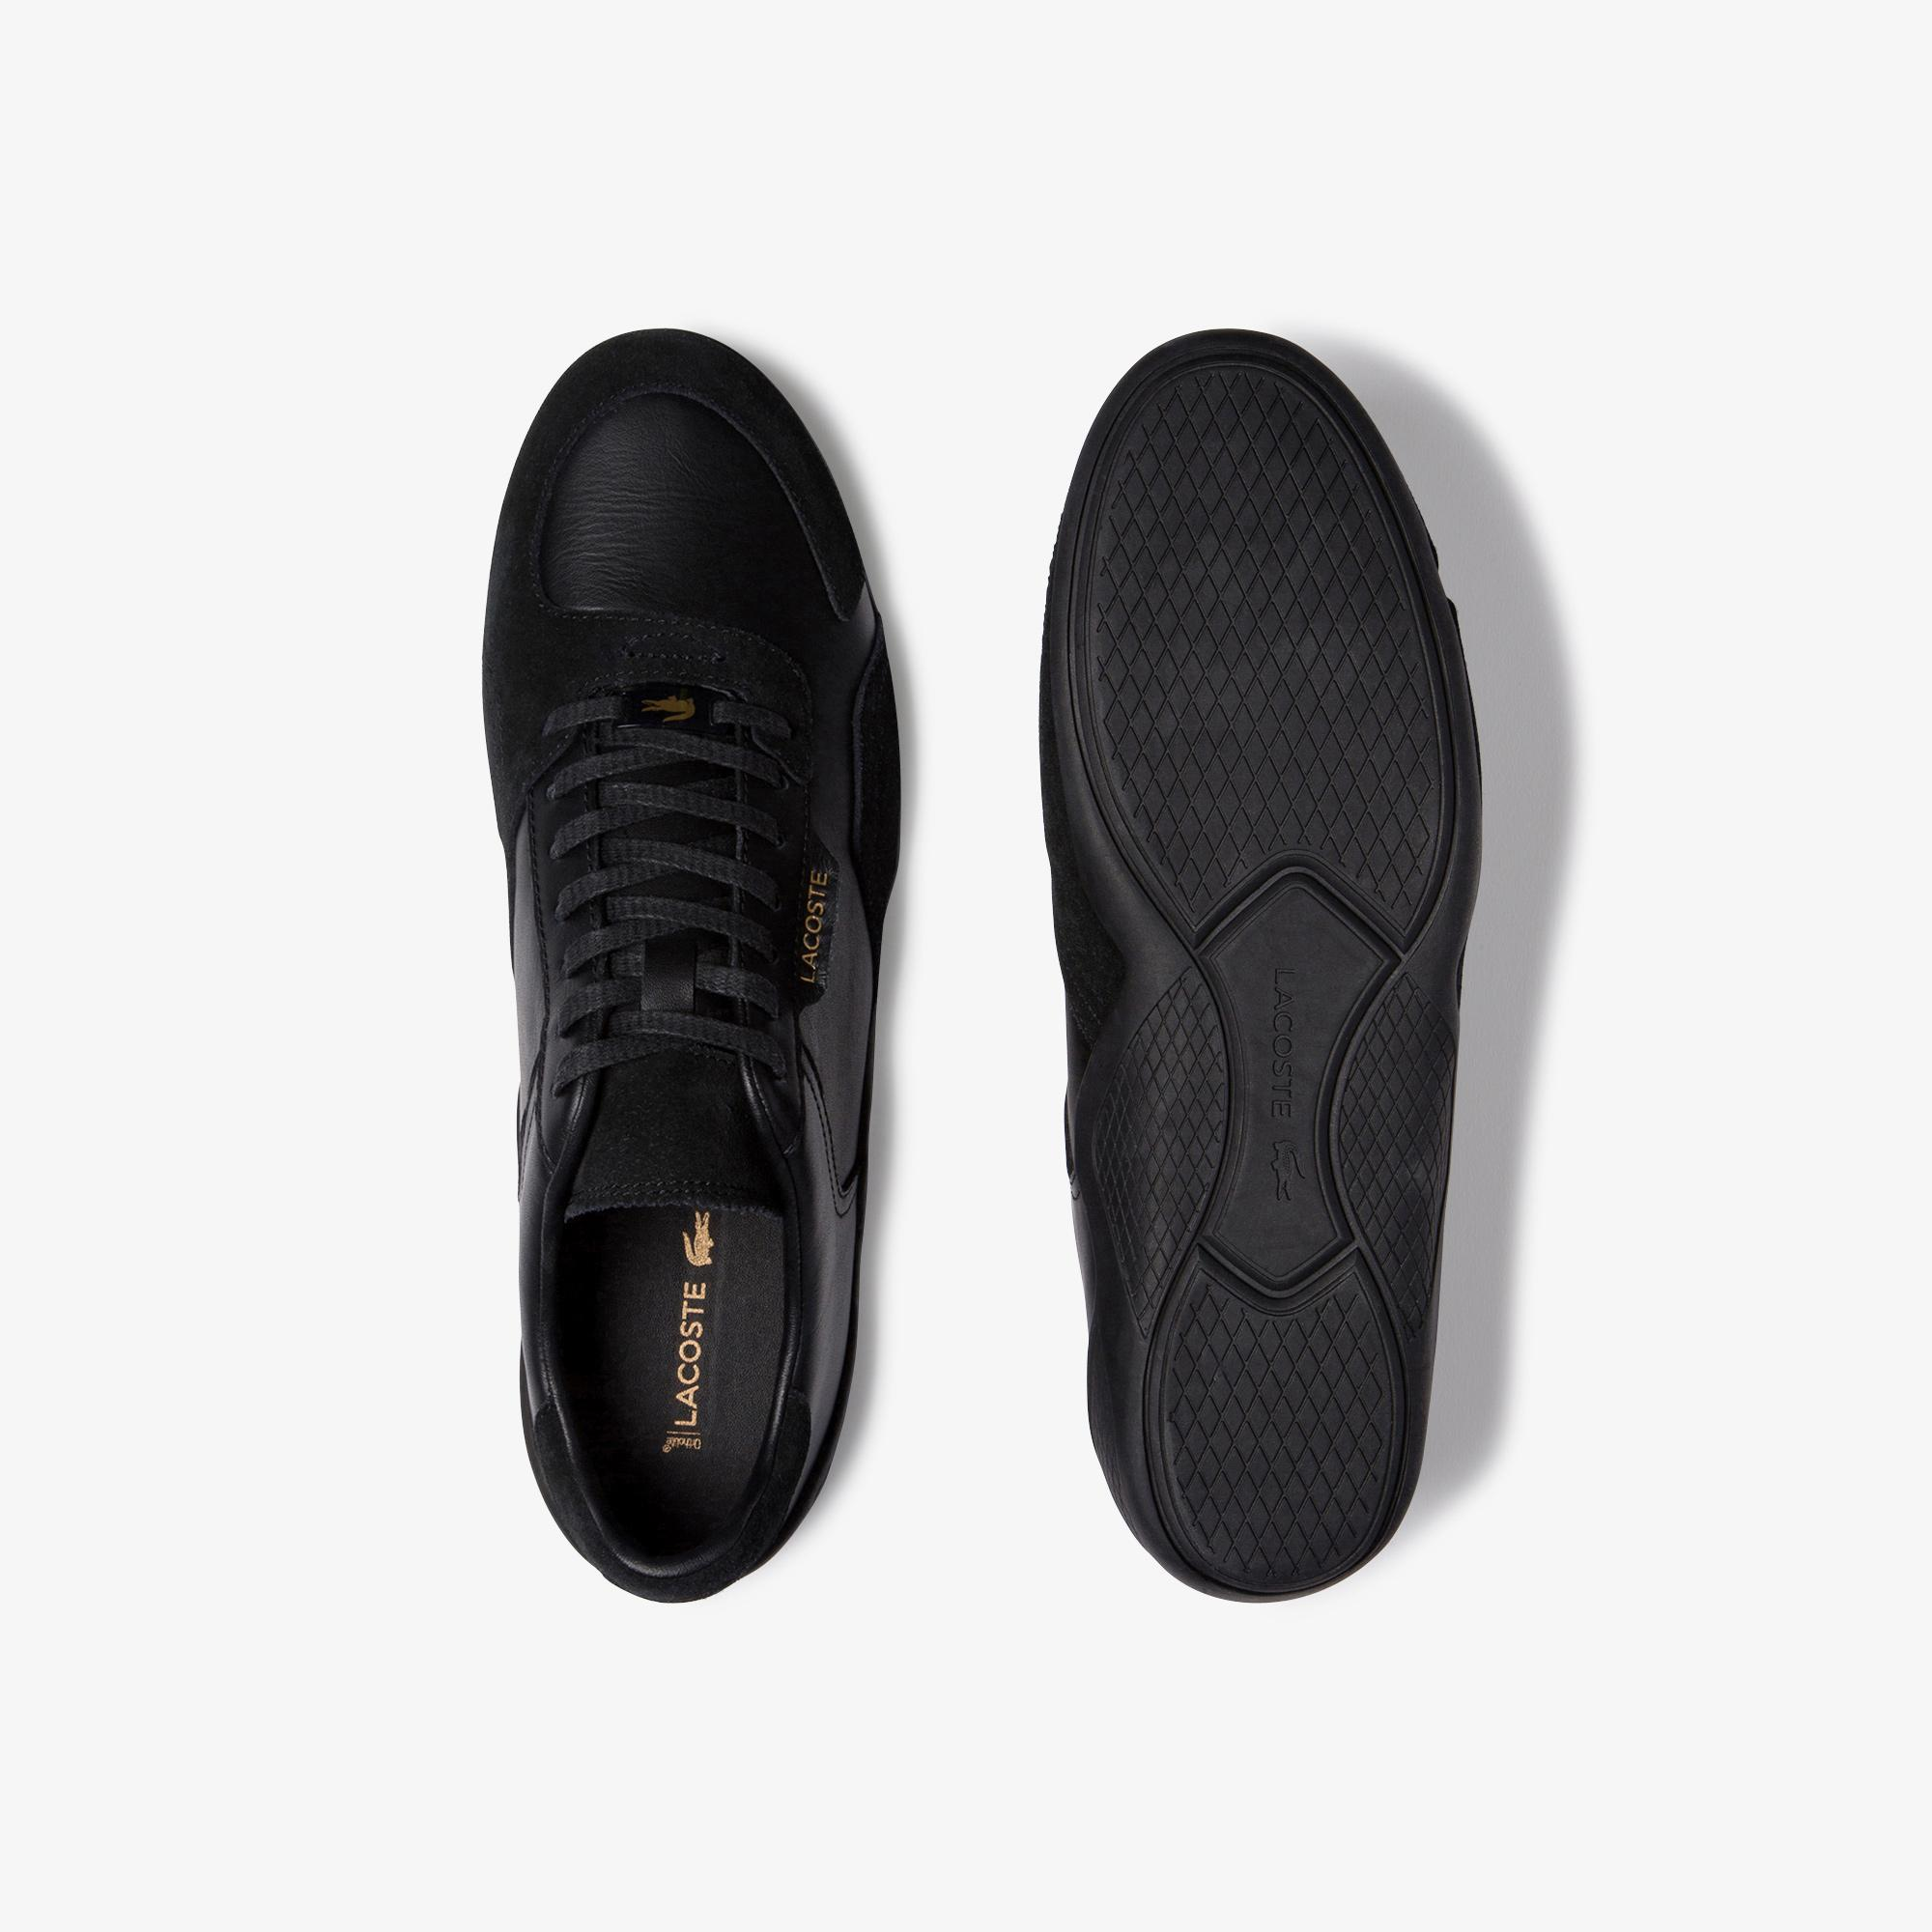 Lacoste Hapona 120 2 Men's Sneakers